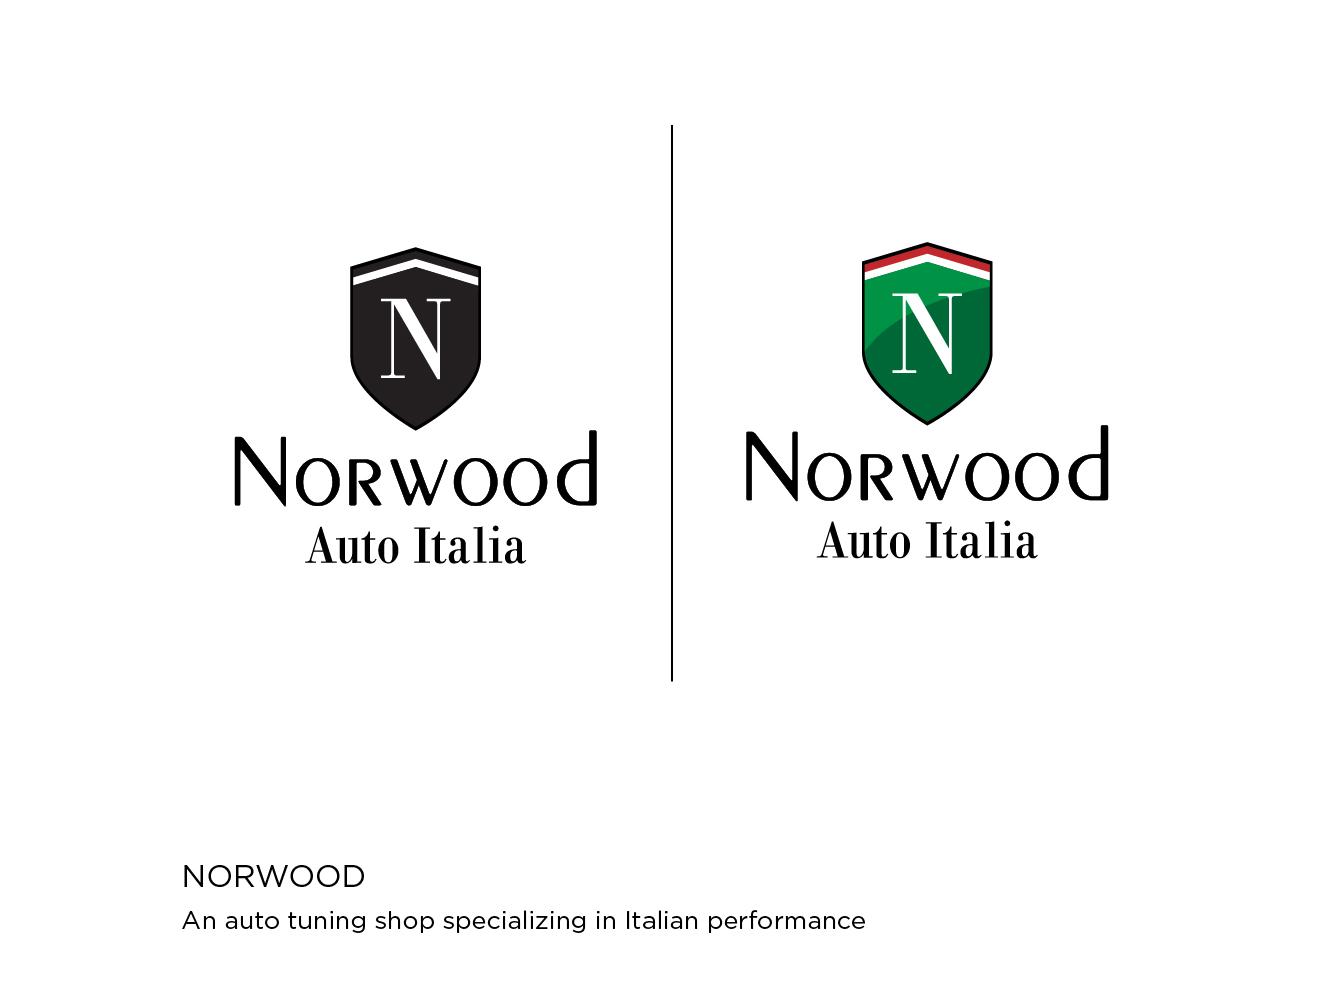 norwood_logo-01.jpg